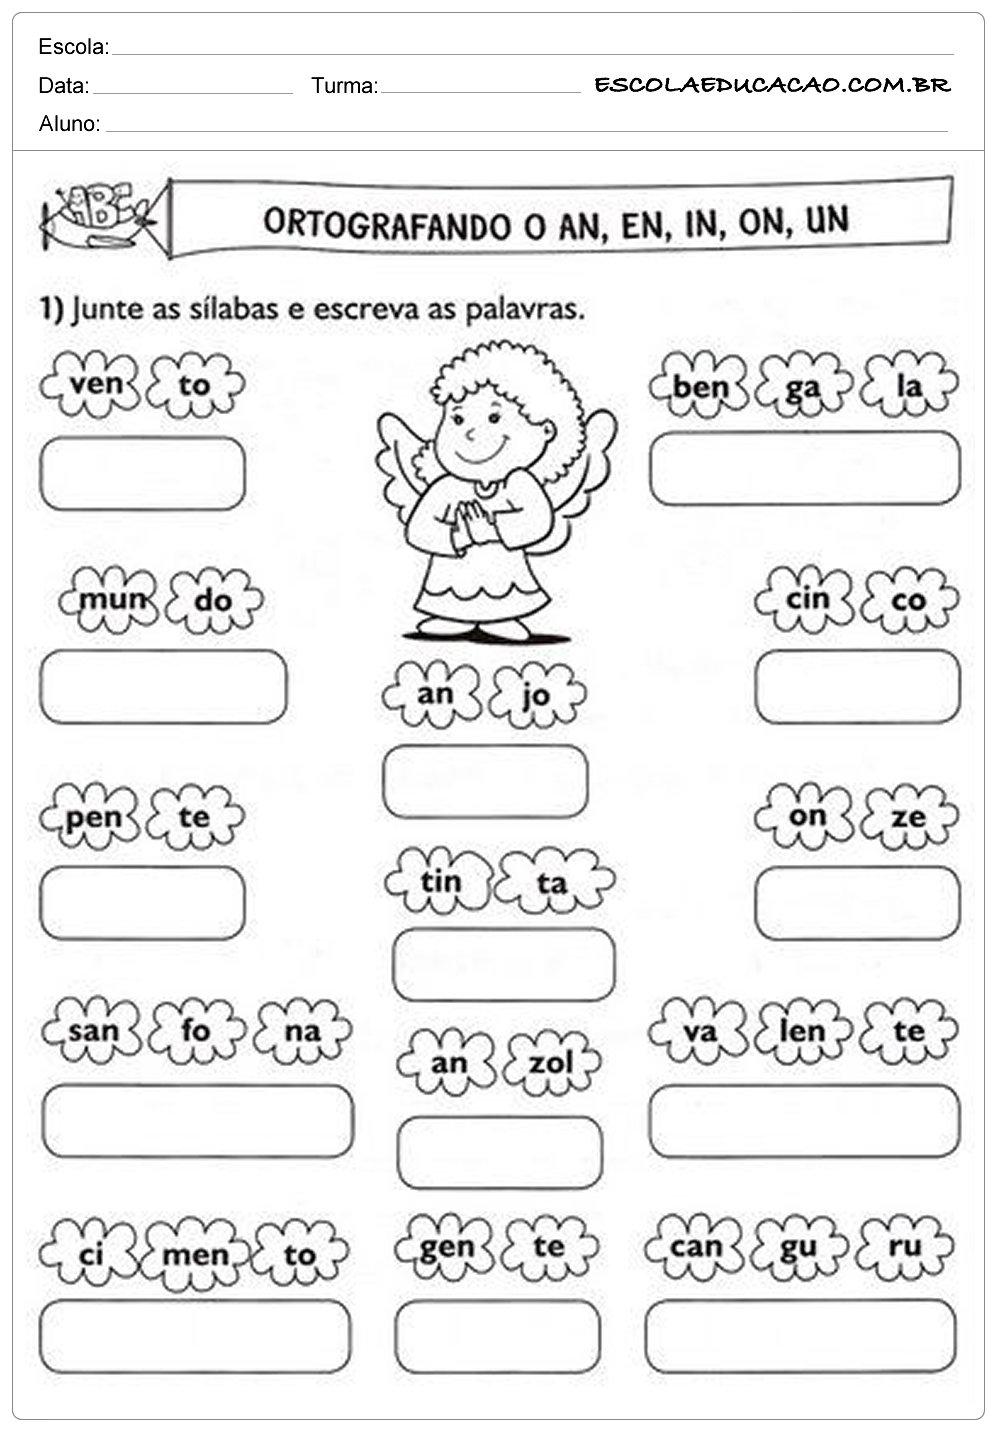 Atividades de Português 2º ano – Ortografia an, en, in, on e un